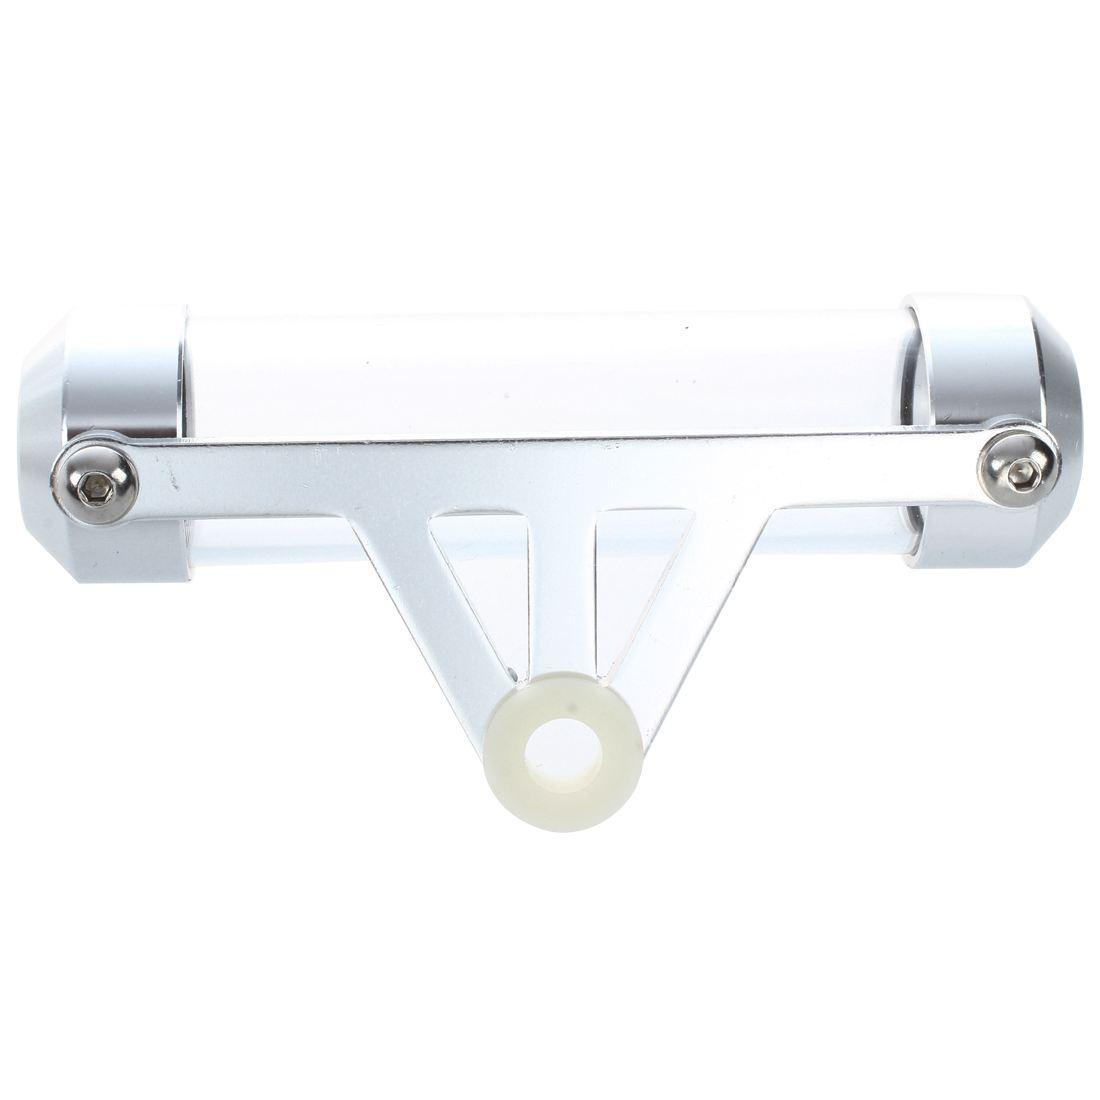 Soporte-de-tubo-de-disco-de-impuesto-de-metal-Moto-Scooter-Motocicleta-Ciclo-PB miniatura 10